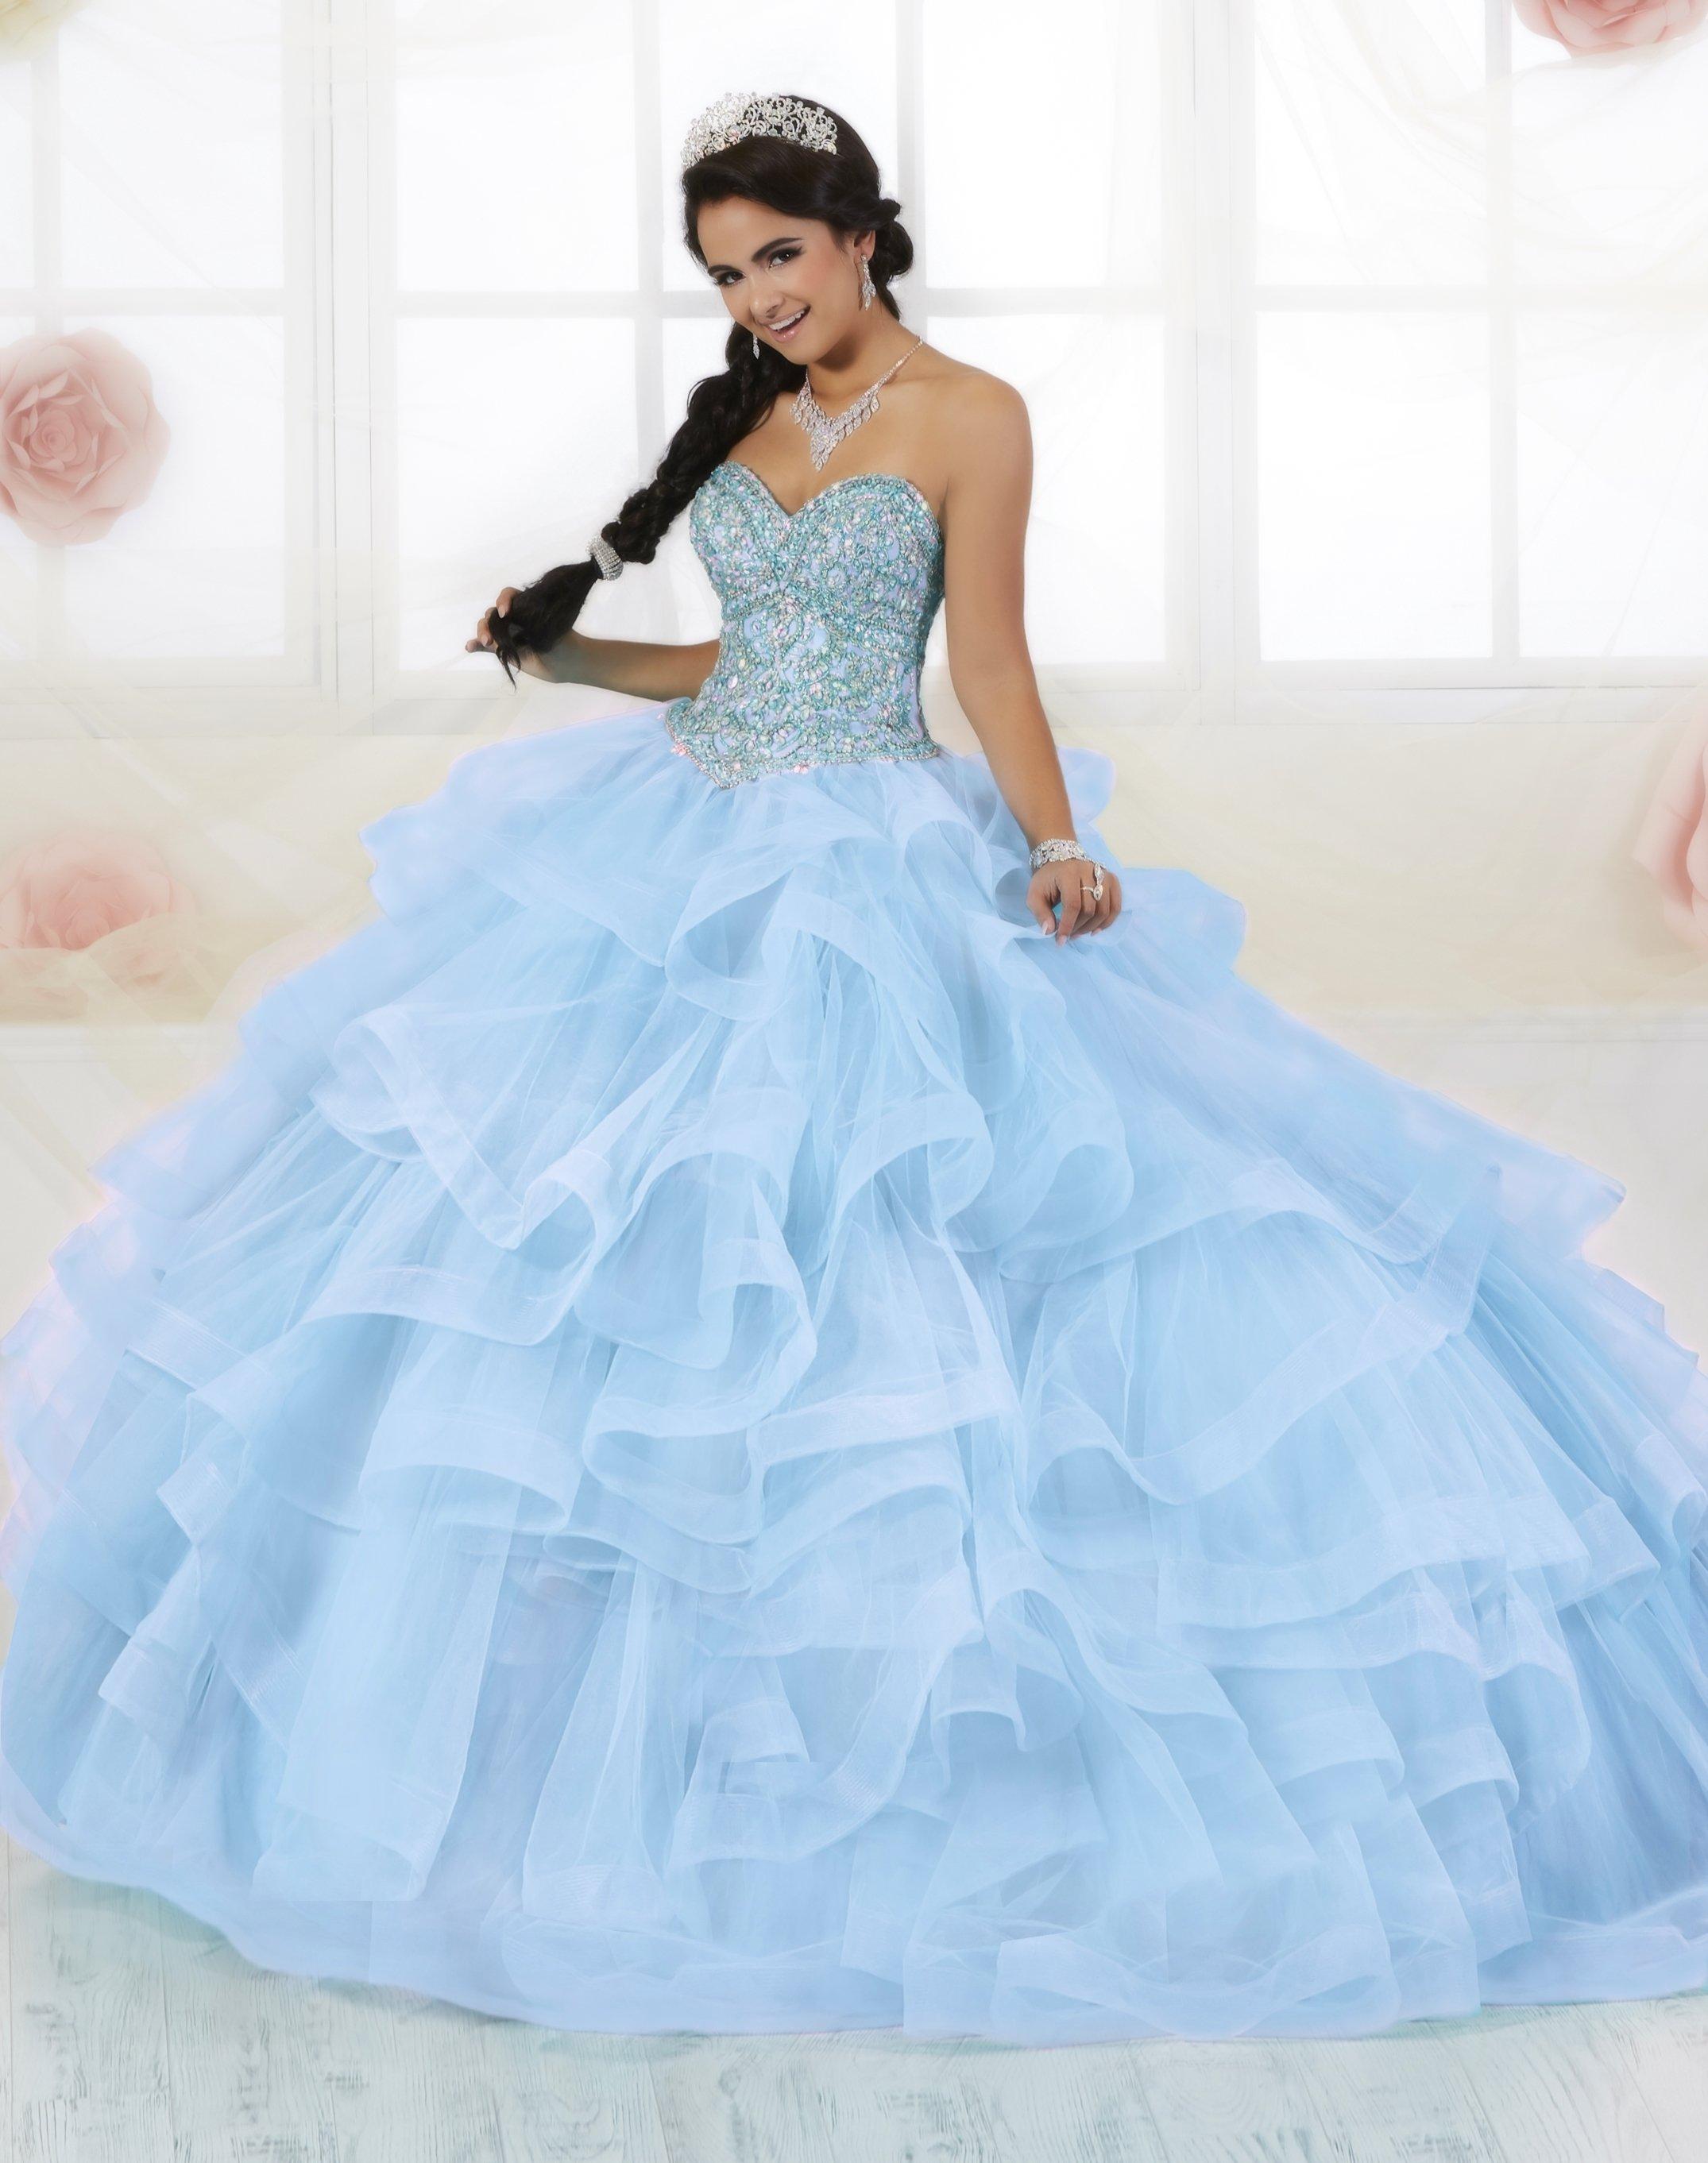 Strapless Ruffled Quinceanera Dress By Fiesta Gowns 56353 Size 14 26 In 2021 Quinceanera Dresses Quinceanera Dresses Blue Ball Gowns [ 2723 x 2150 Pixel ]